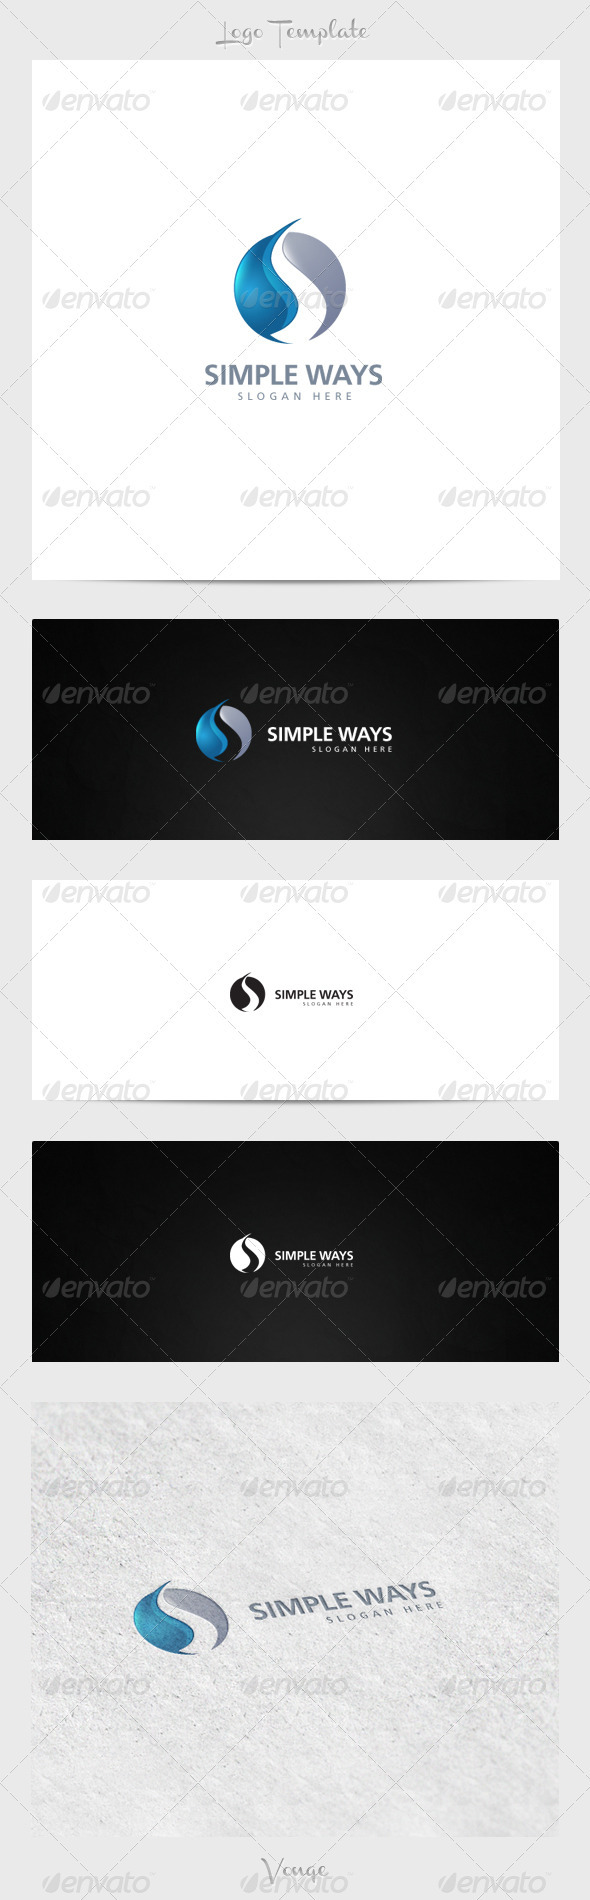 GraphicRiver Simple Ways 3915857